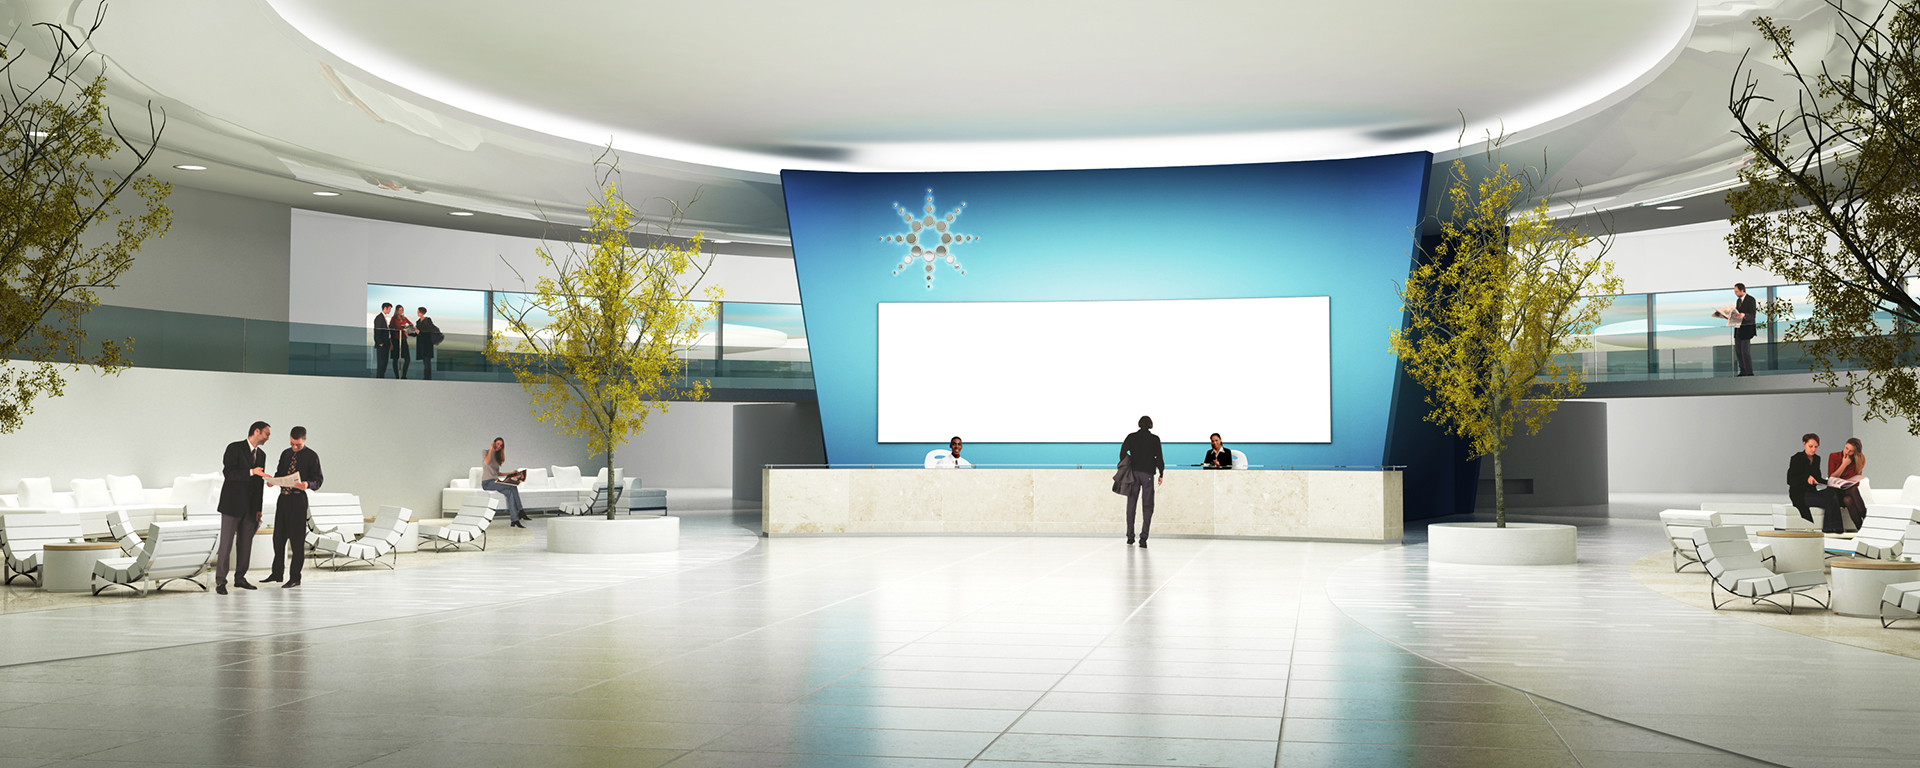 3D Futuristic Corporate Building Reception Lobby Illustration